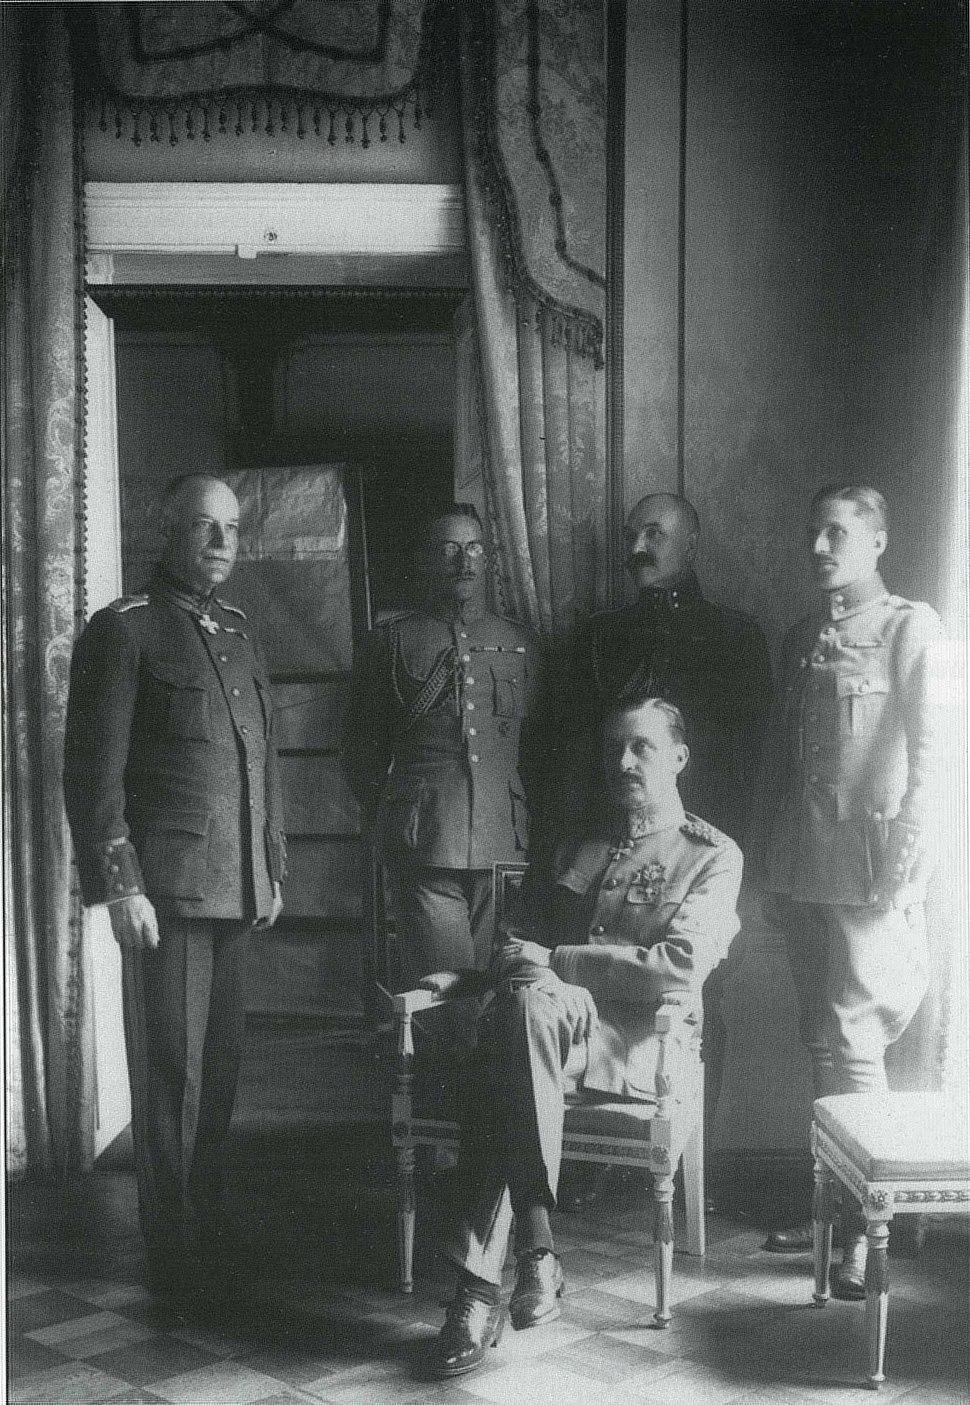 Mannerheim, Lilius, Kekoni, Gallen-Kallela, Rosenbröijer